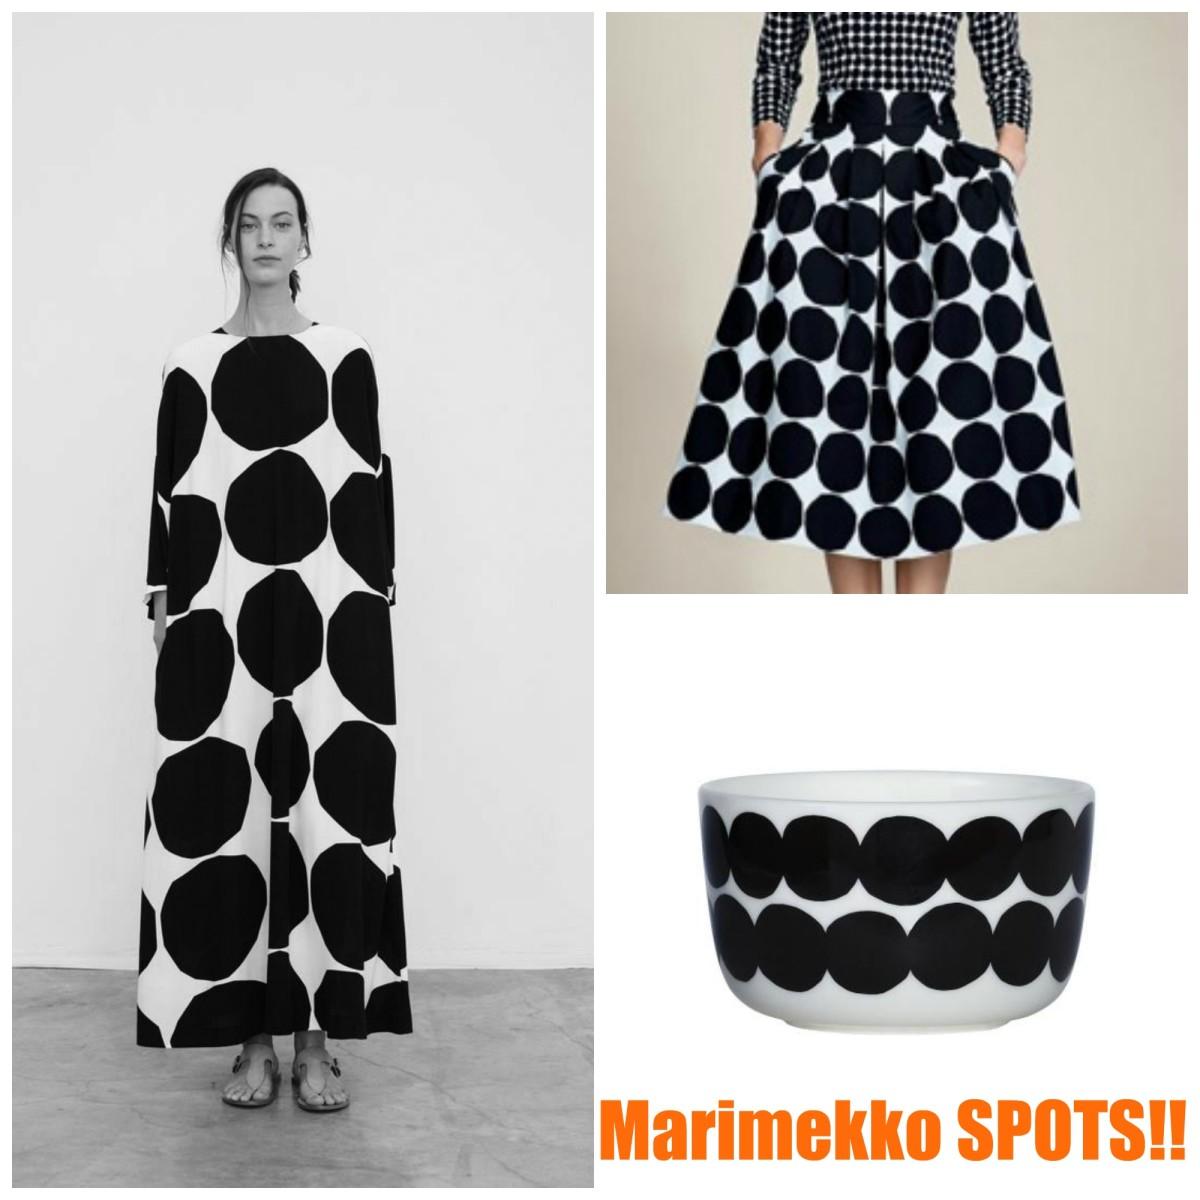 Marimekko takes the spot to haute couture!